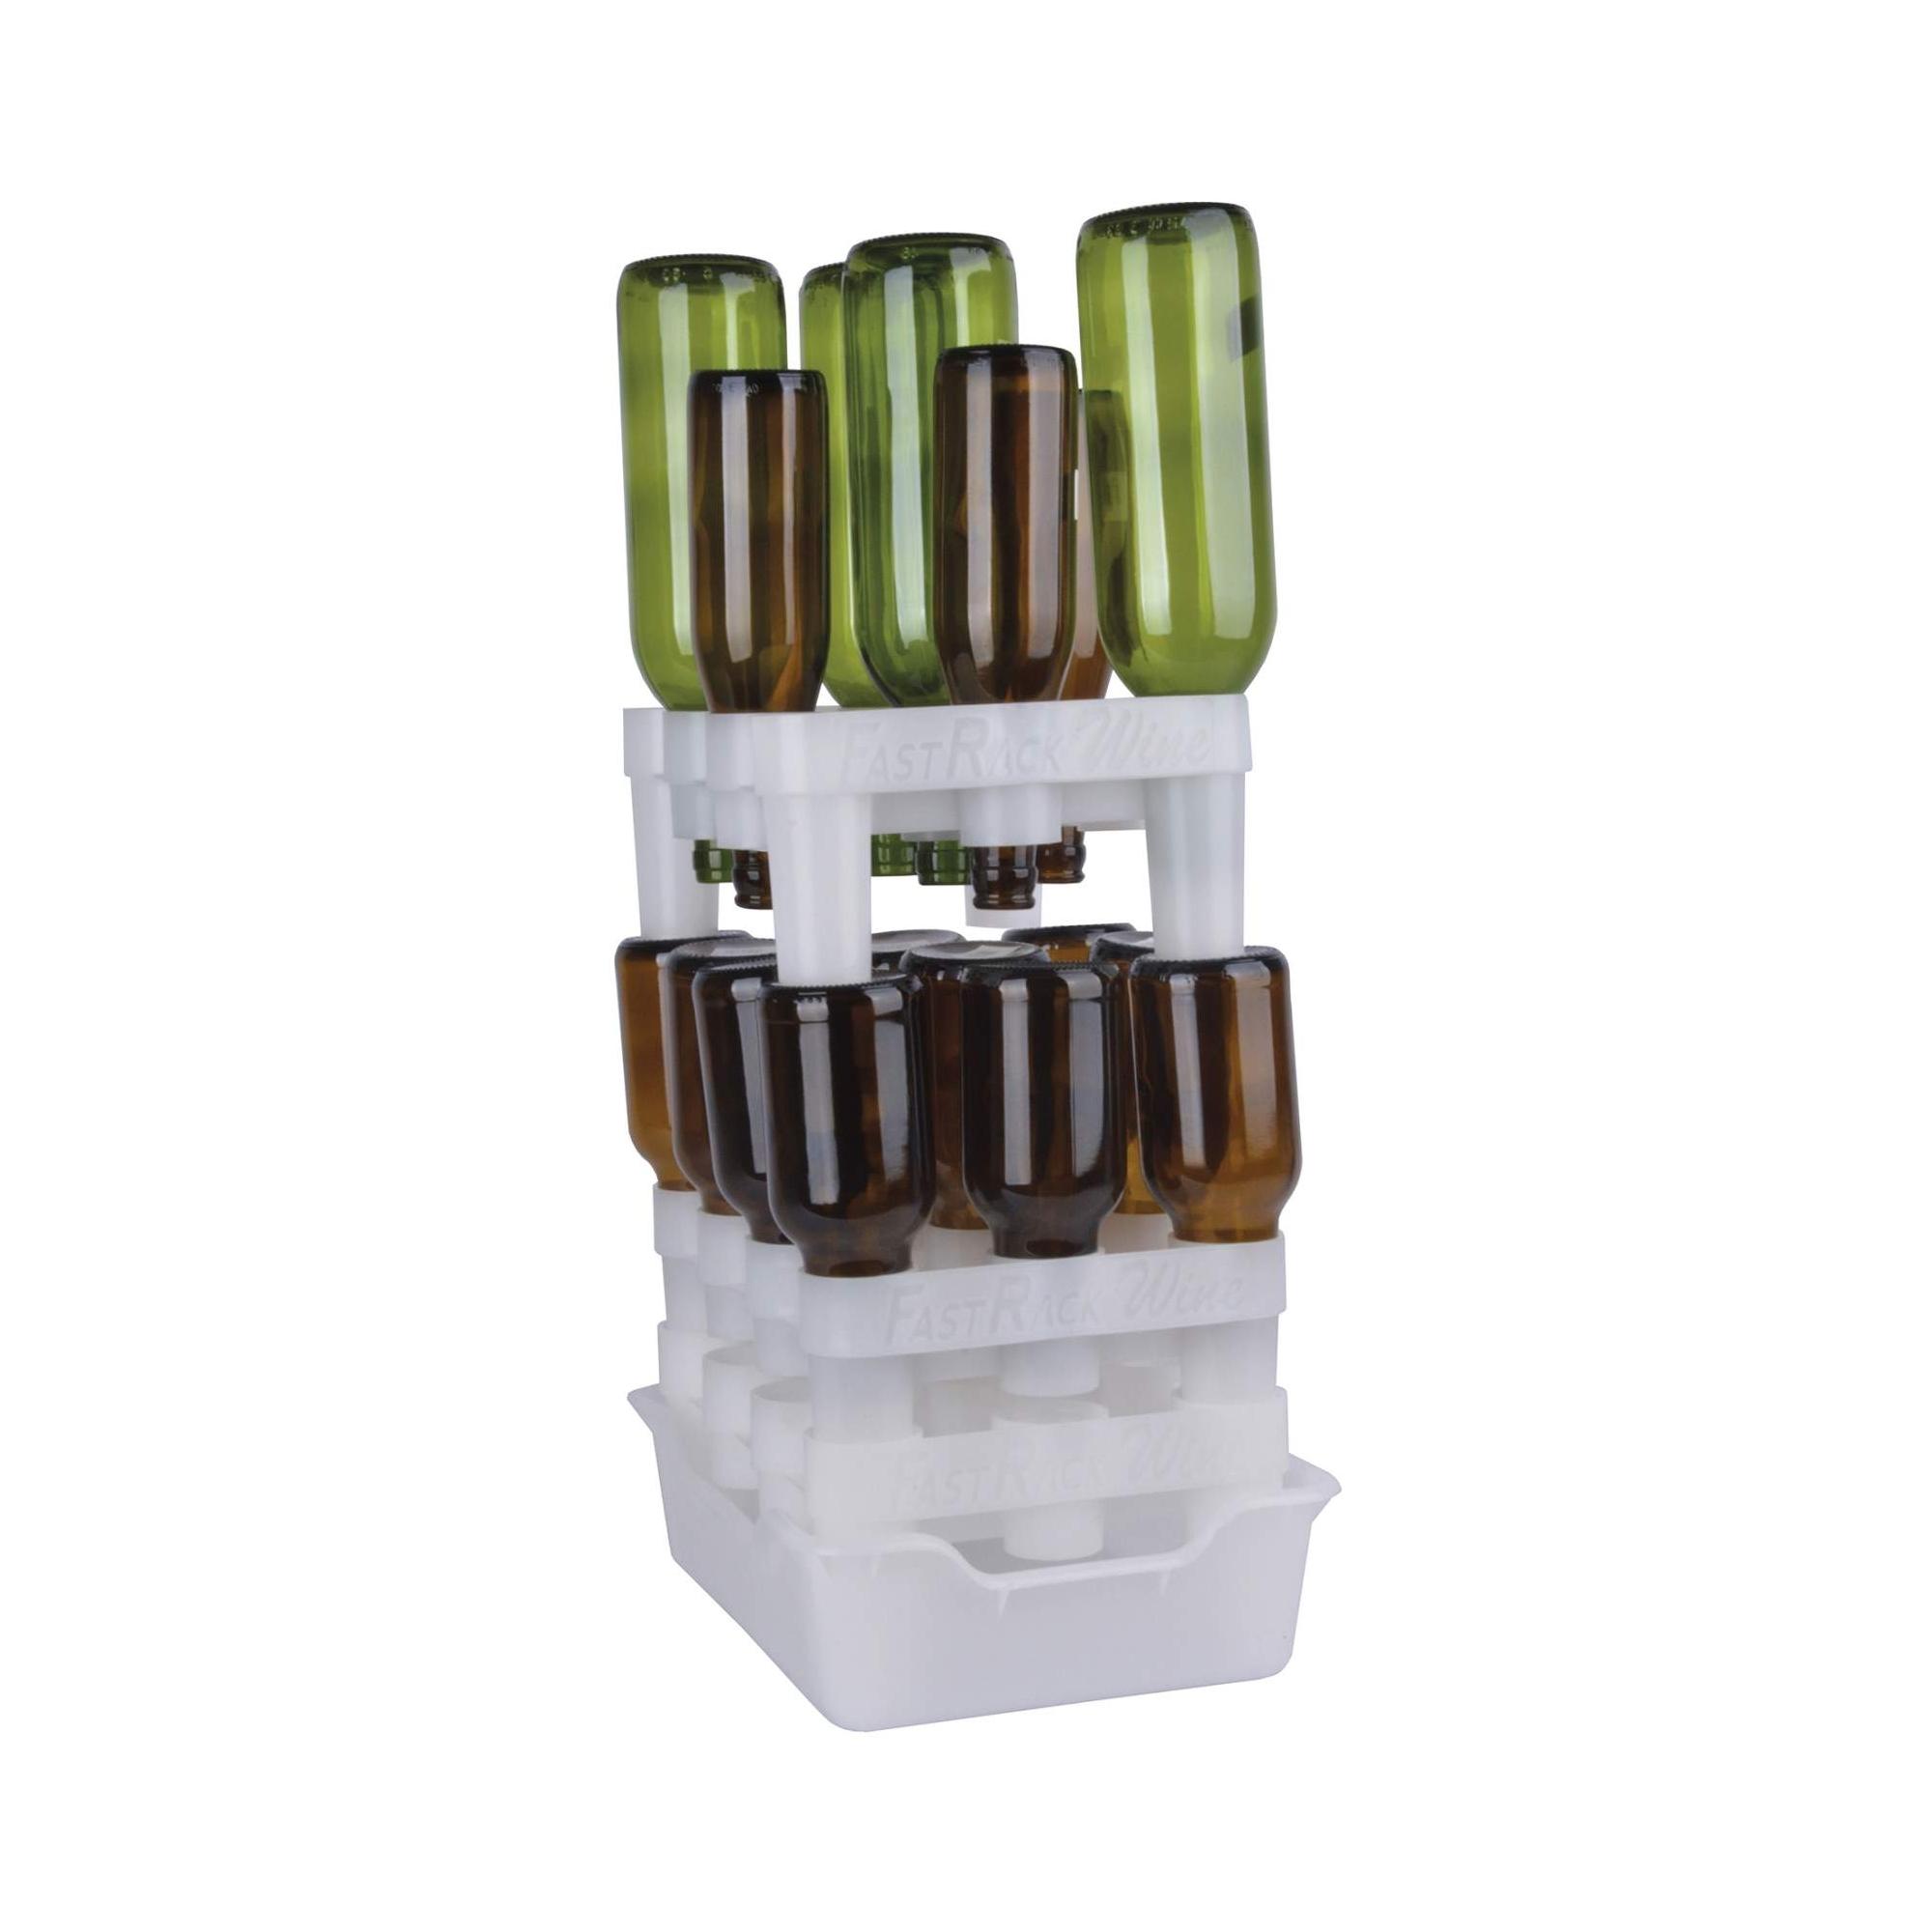 egouttoir fast rack 12 bouteilles s cher vos bouteilles vides. Black Bedroom Furniture Sets. Home Design Ideas